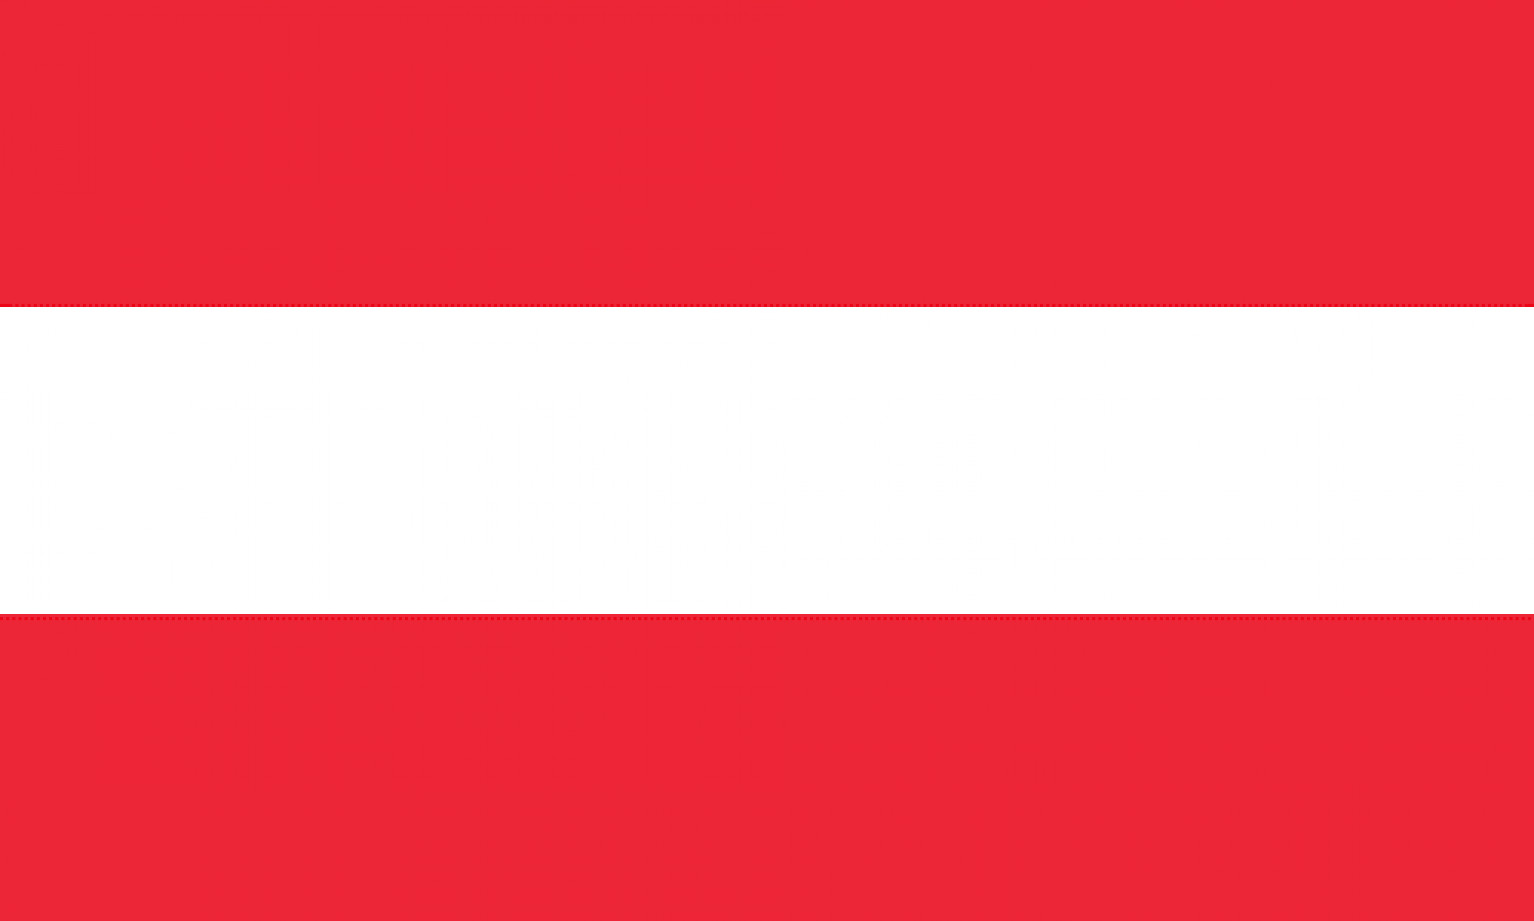 Austrian Peer-to-Peer lending platforms and market